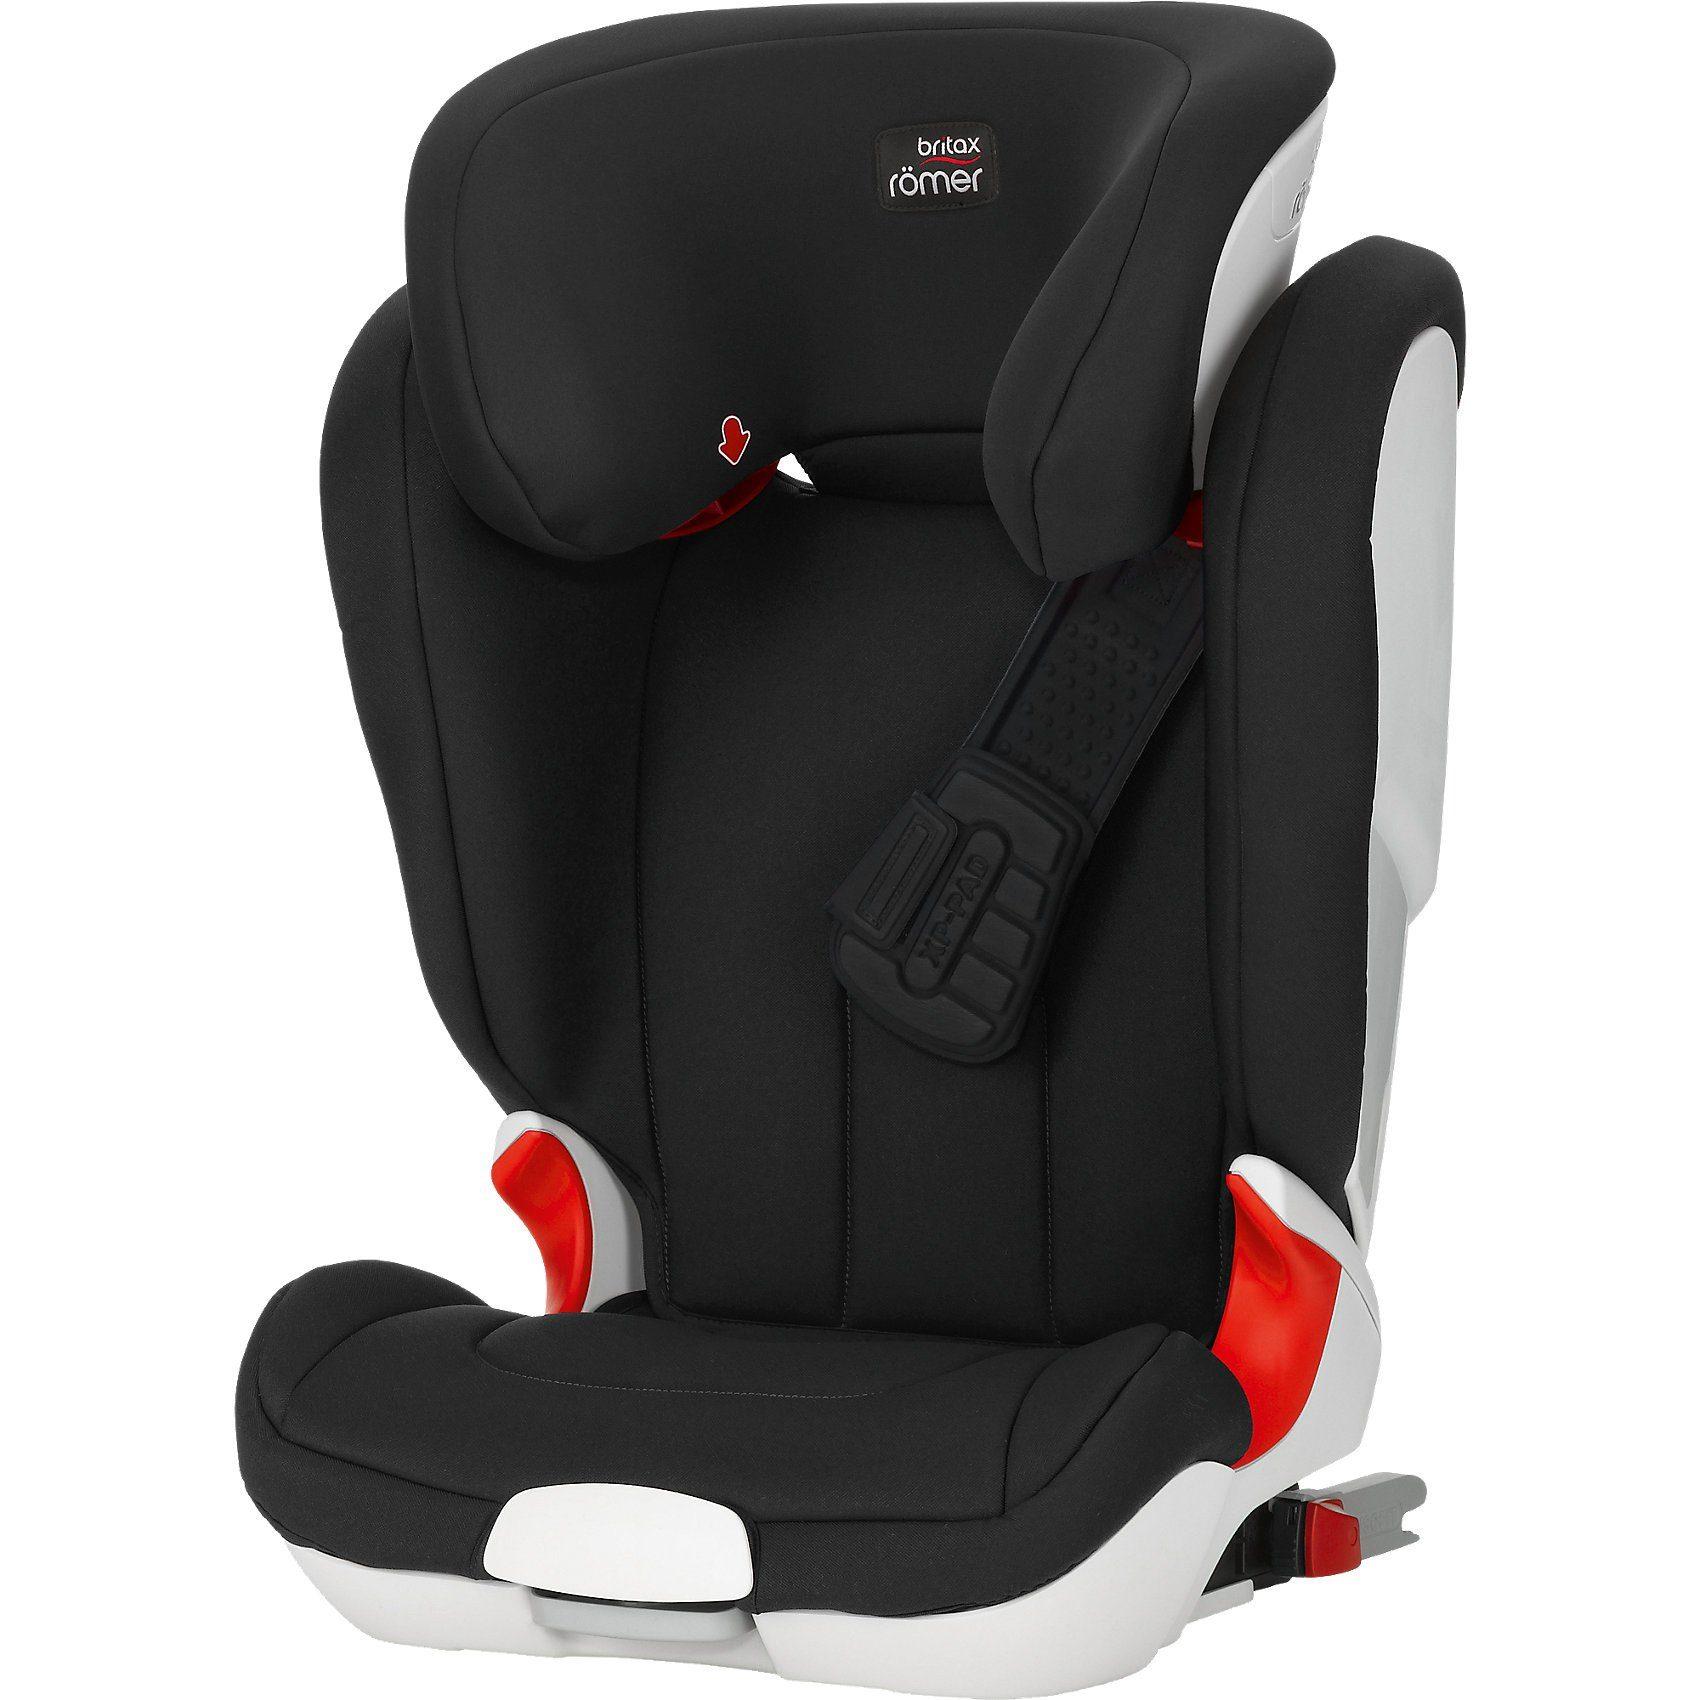 Britax Römer Auto-Kindersitz Kidfix XP, Cosmos Black, 2016